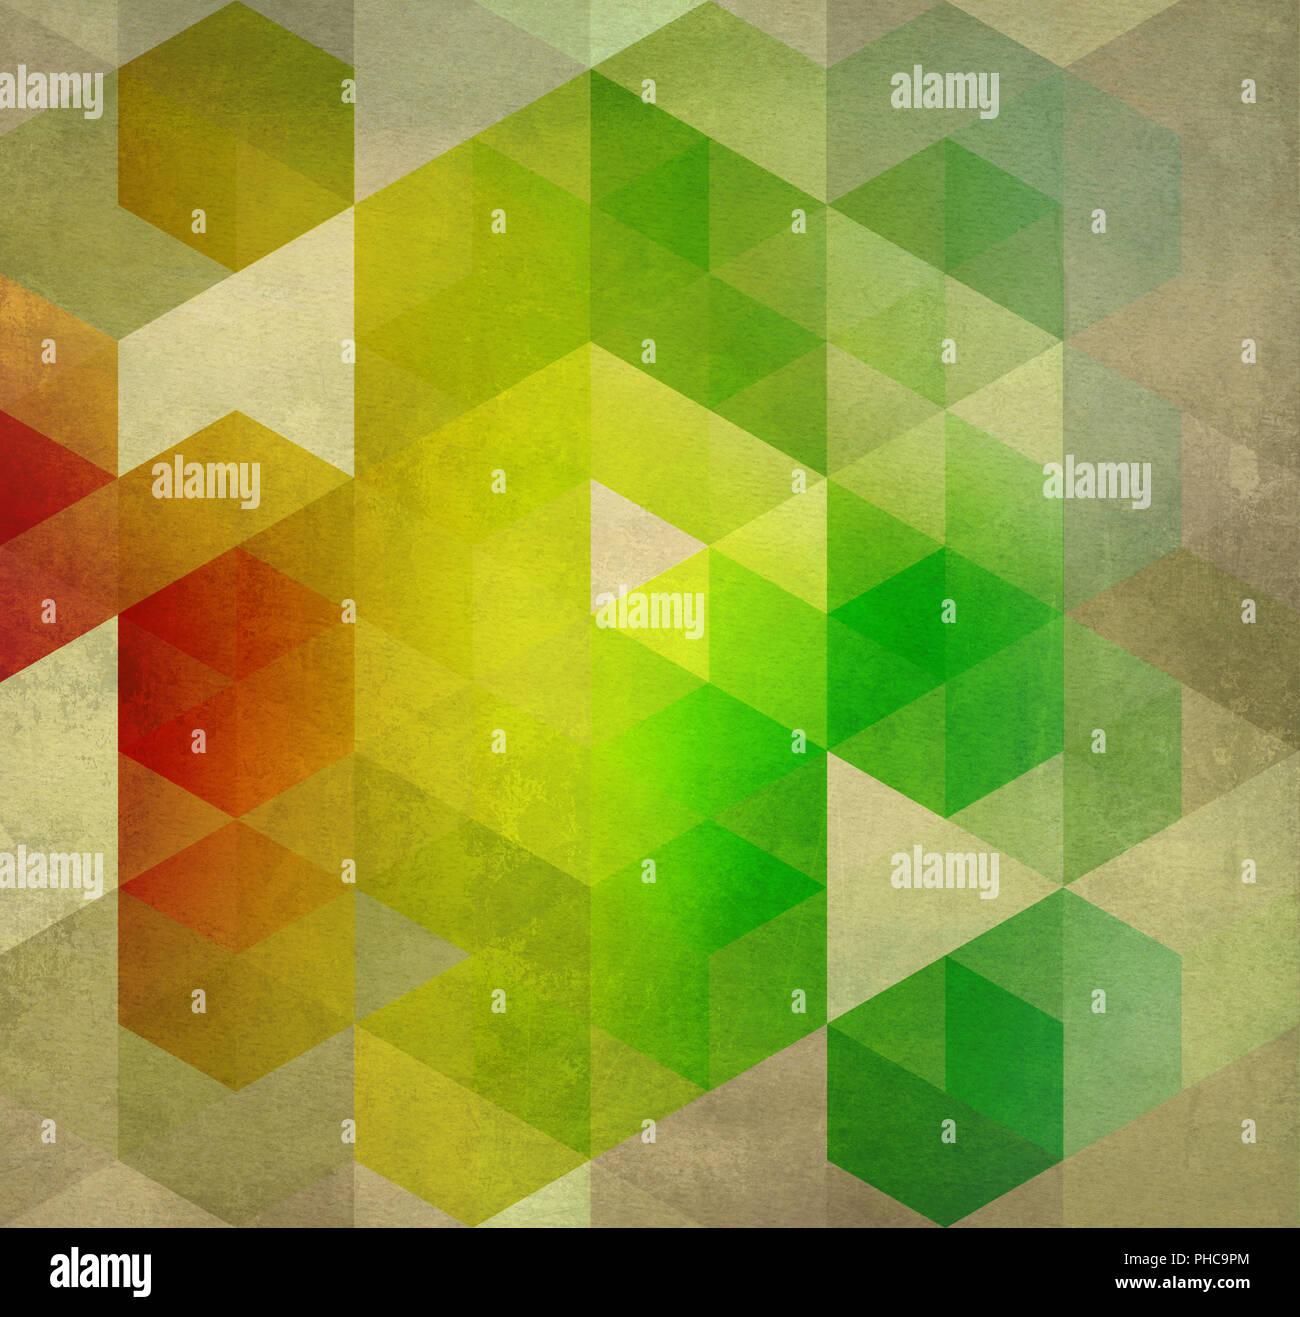 abstract mixed media artwork geometric - Stock Image